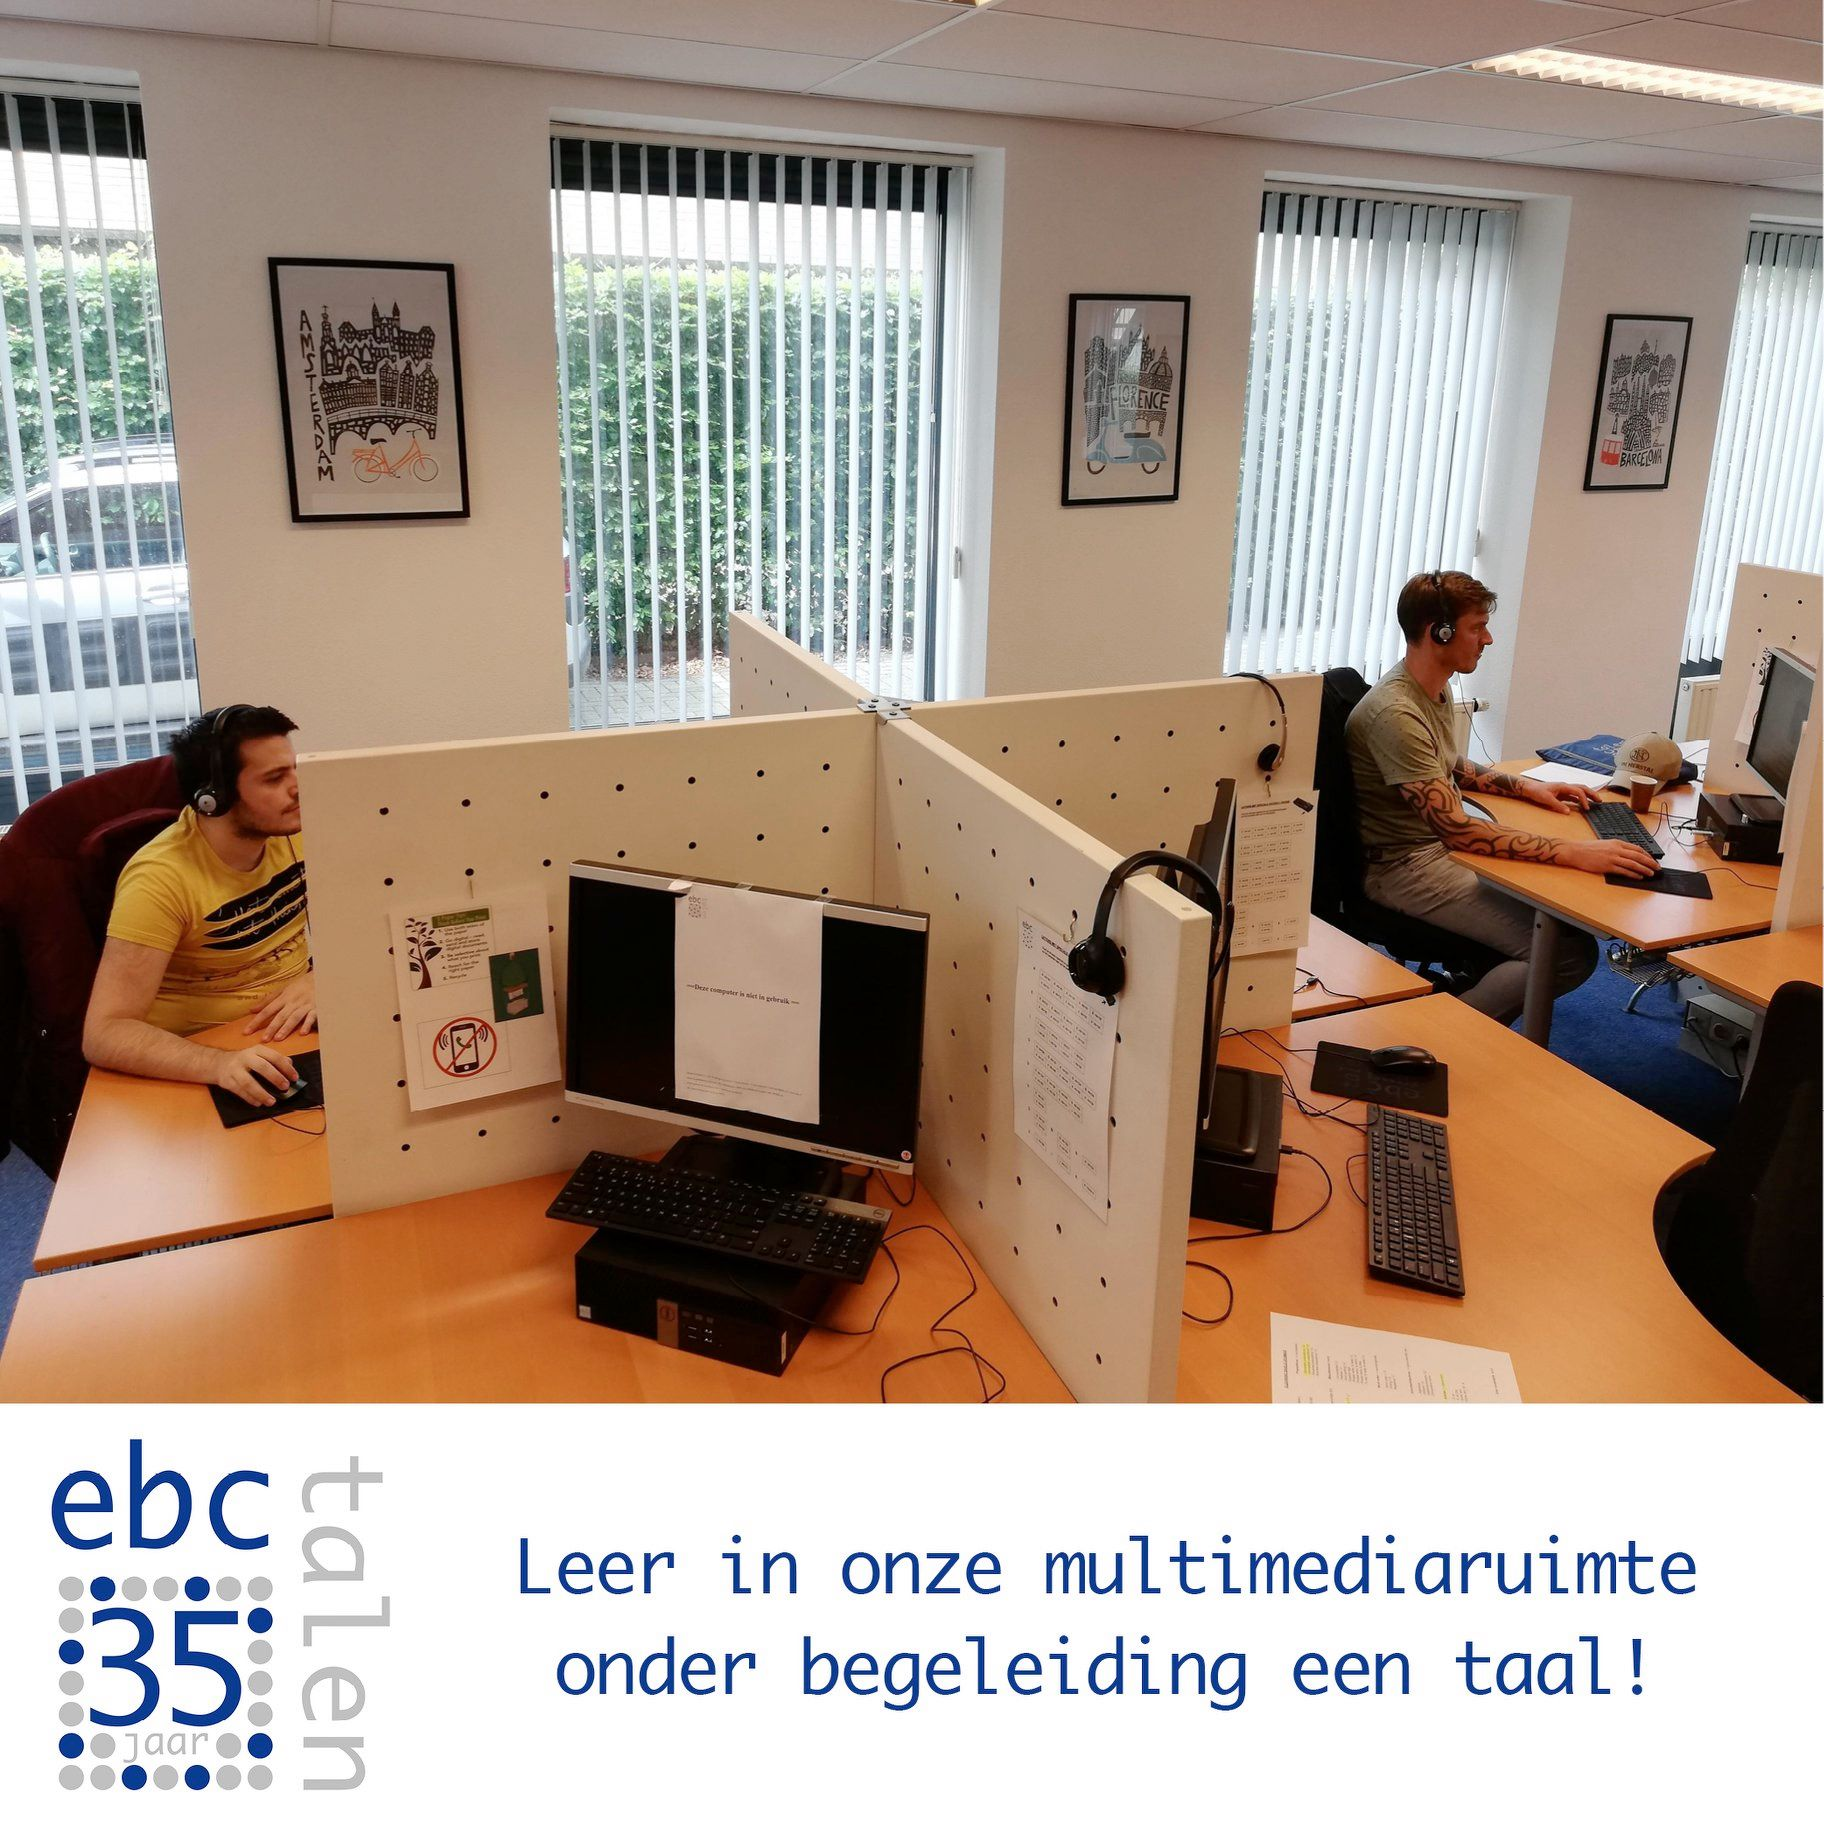 De multimediaruimte van EBC Taleninstituut